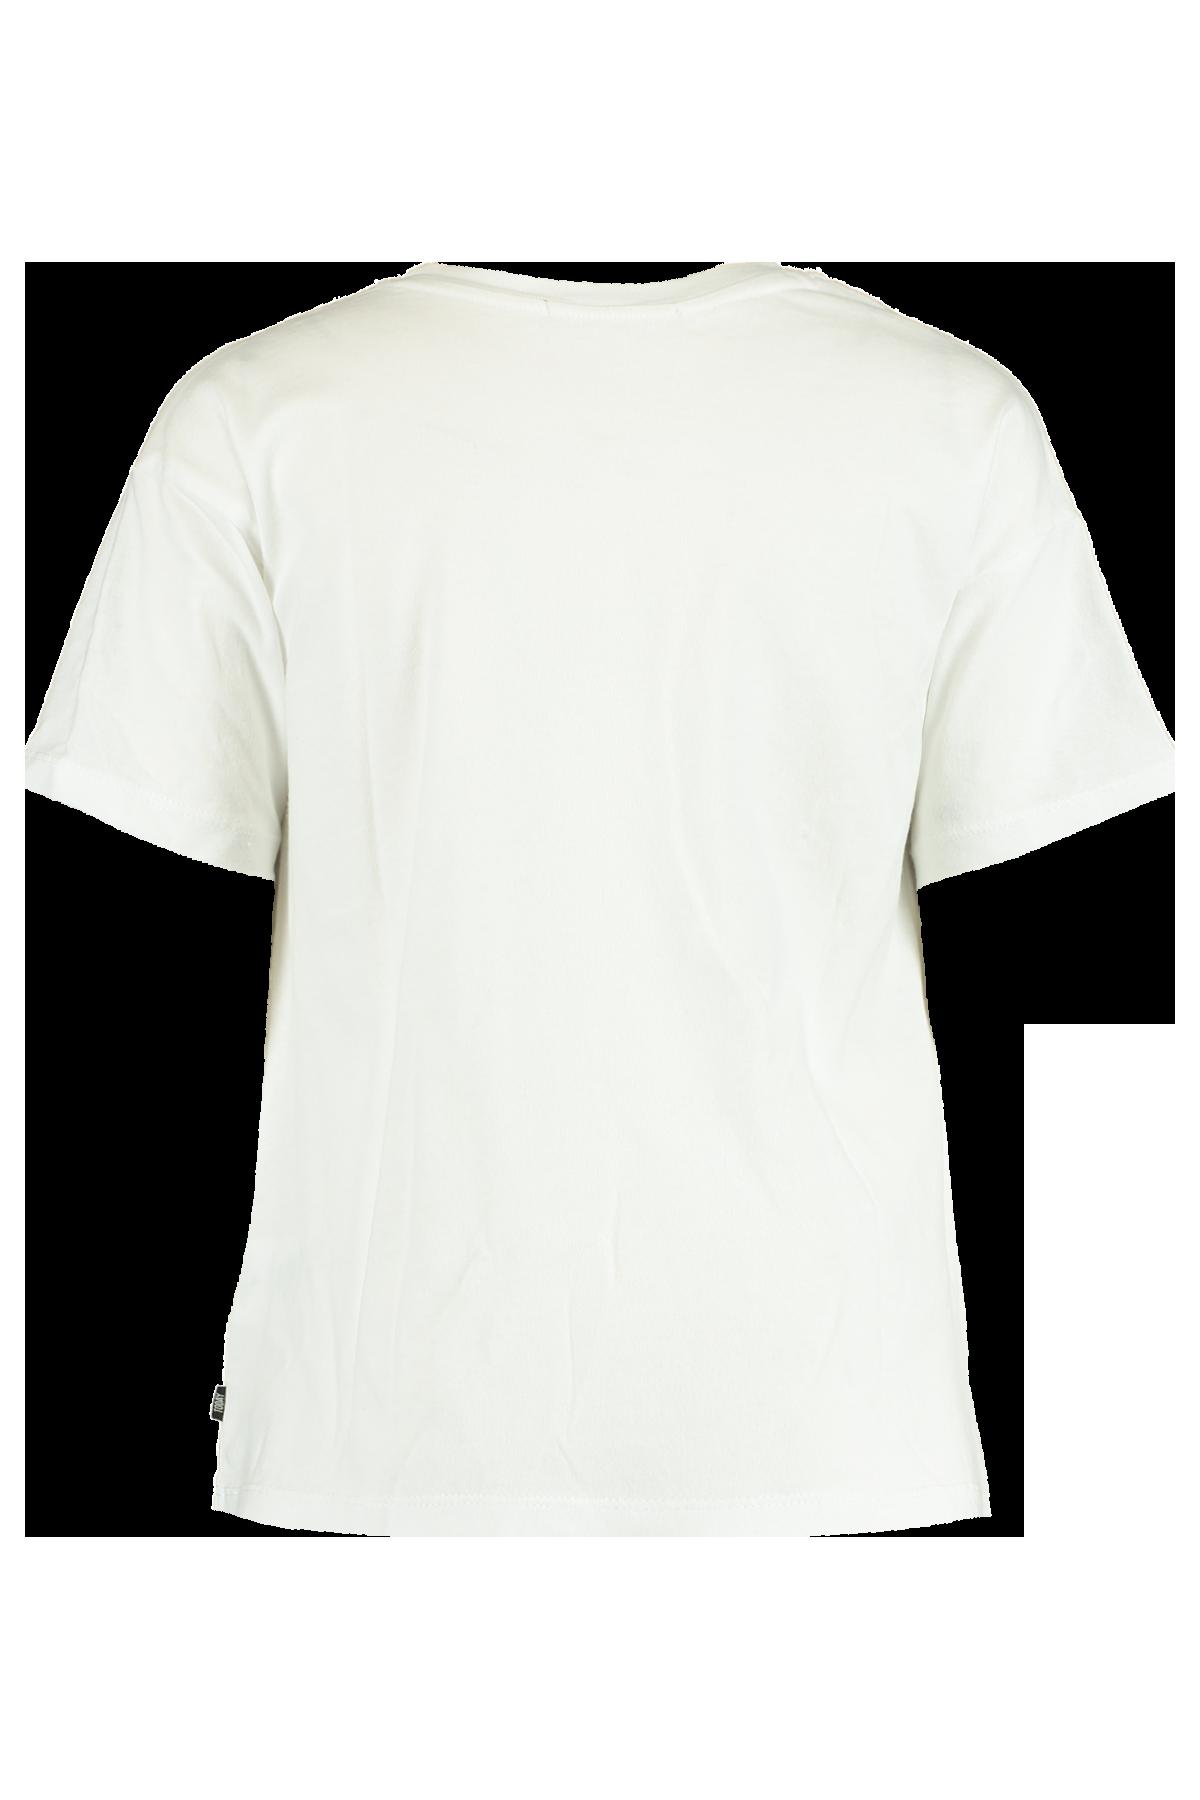 T-shirt Ensley Jr